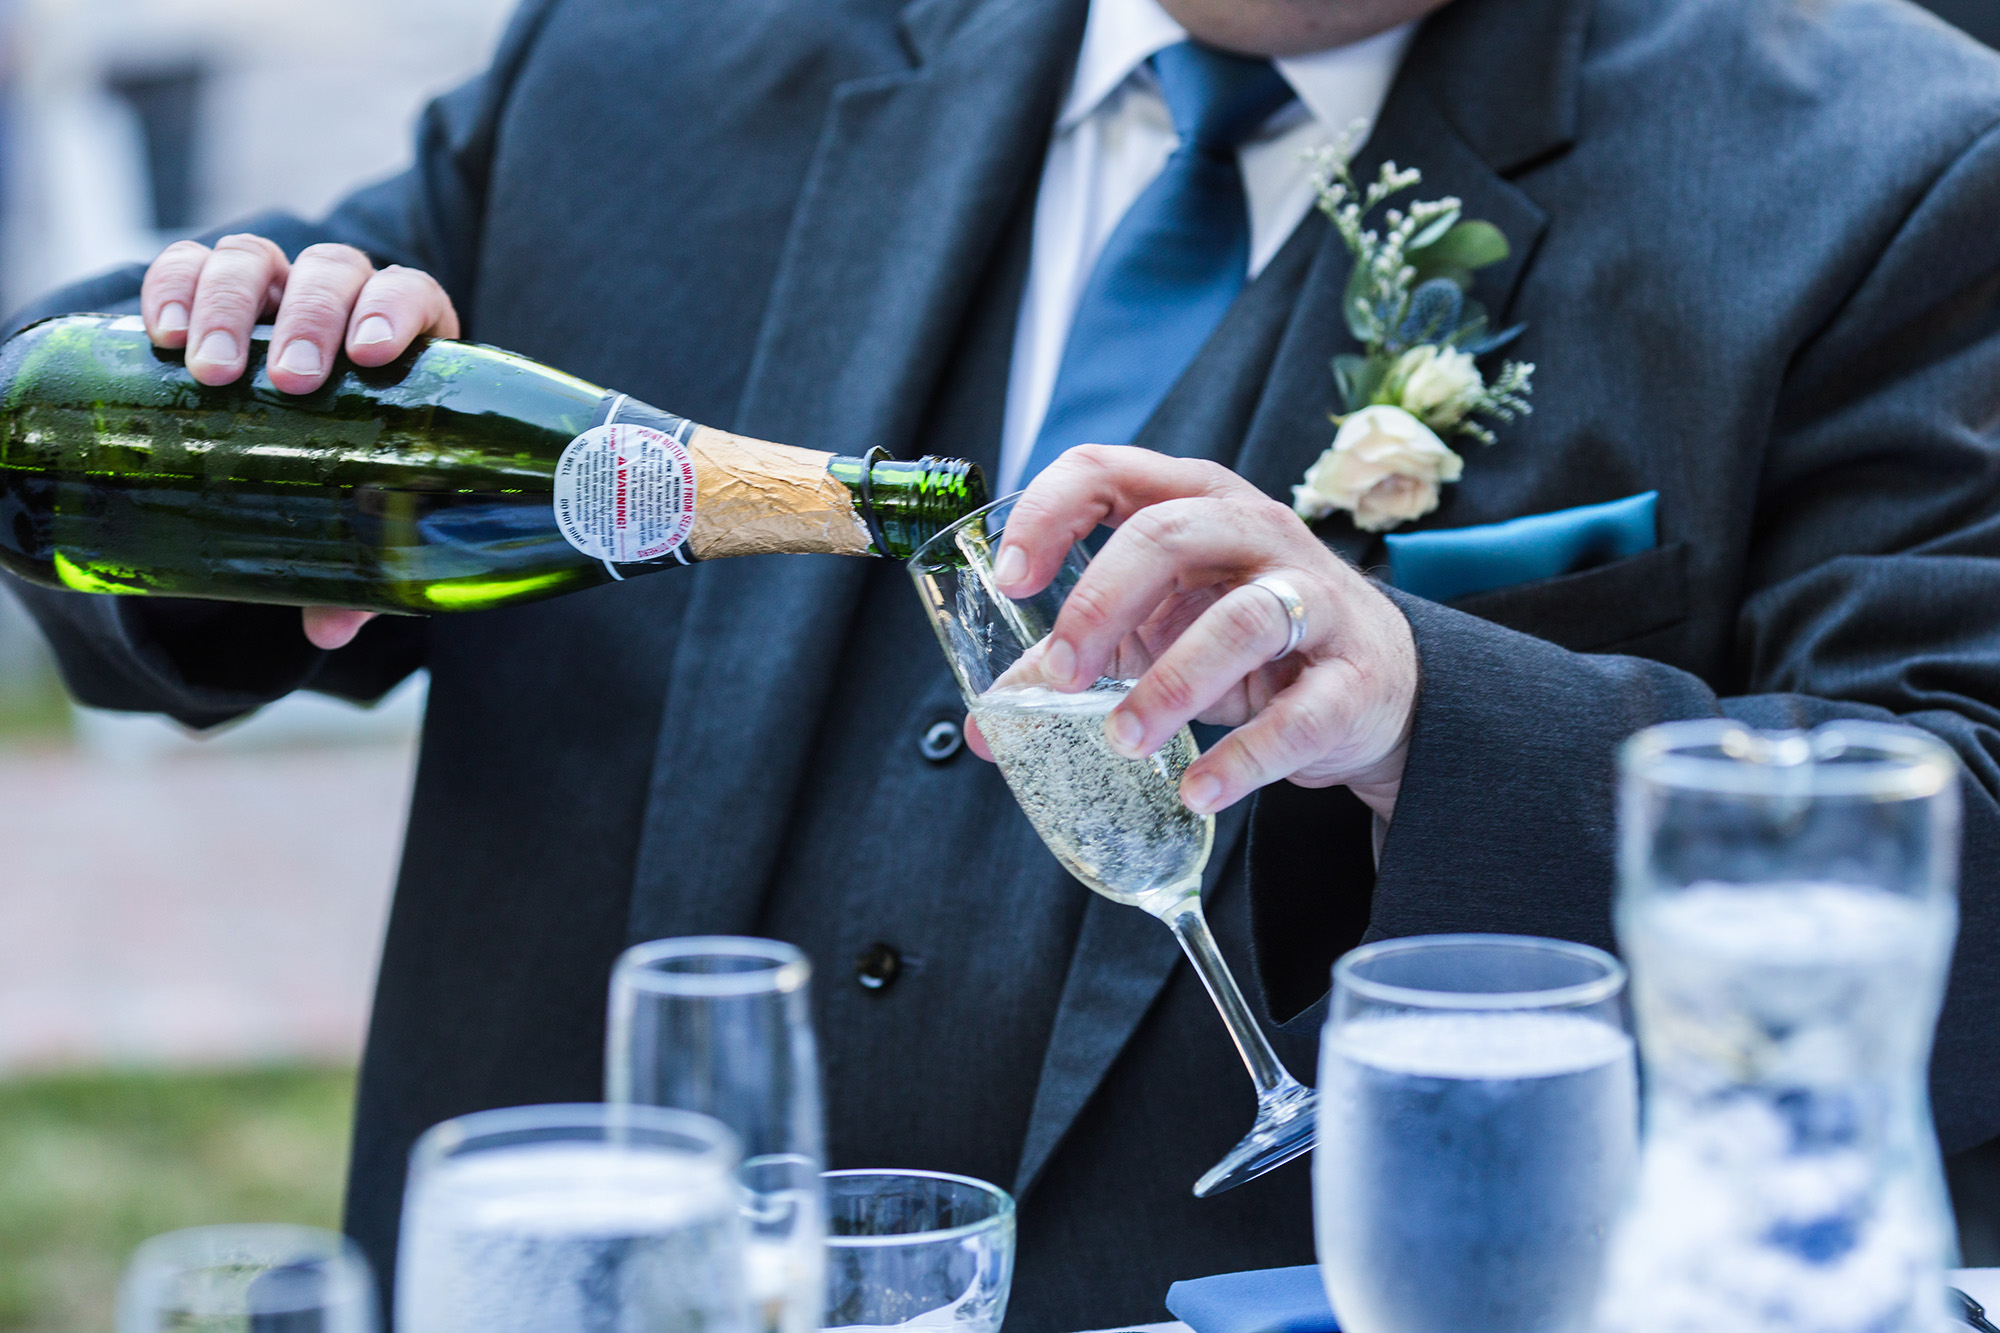 associate-photographer-christmas-house-wedding-carrie-vines-0139.jpg